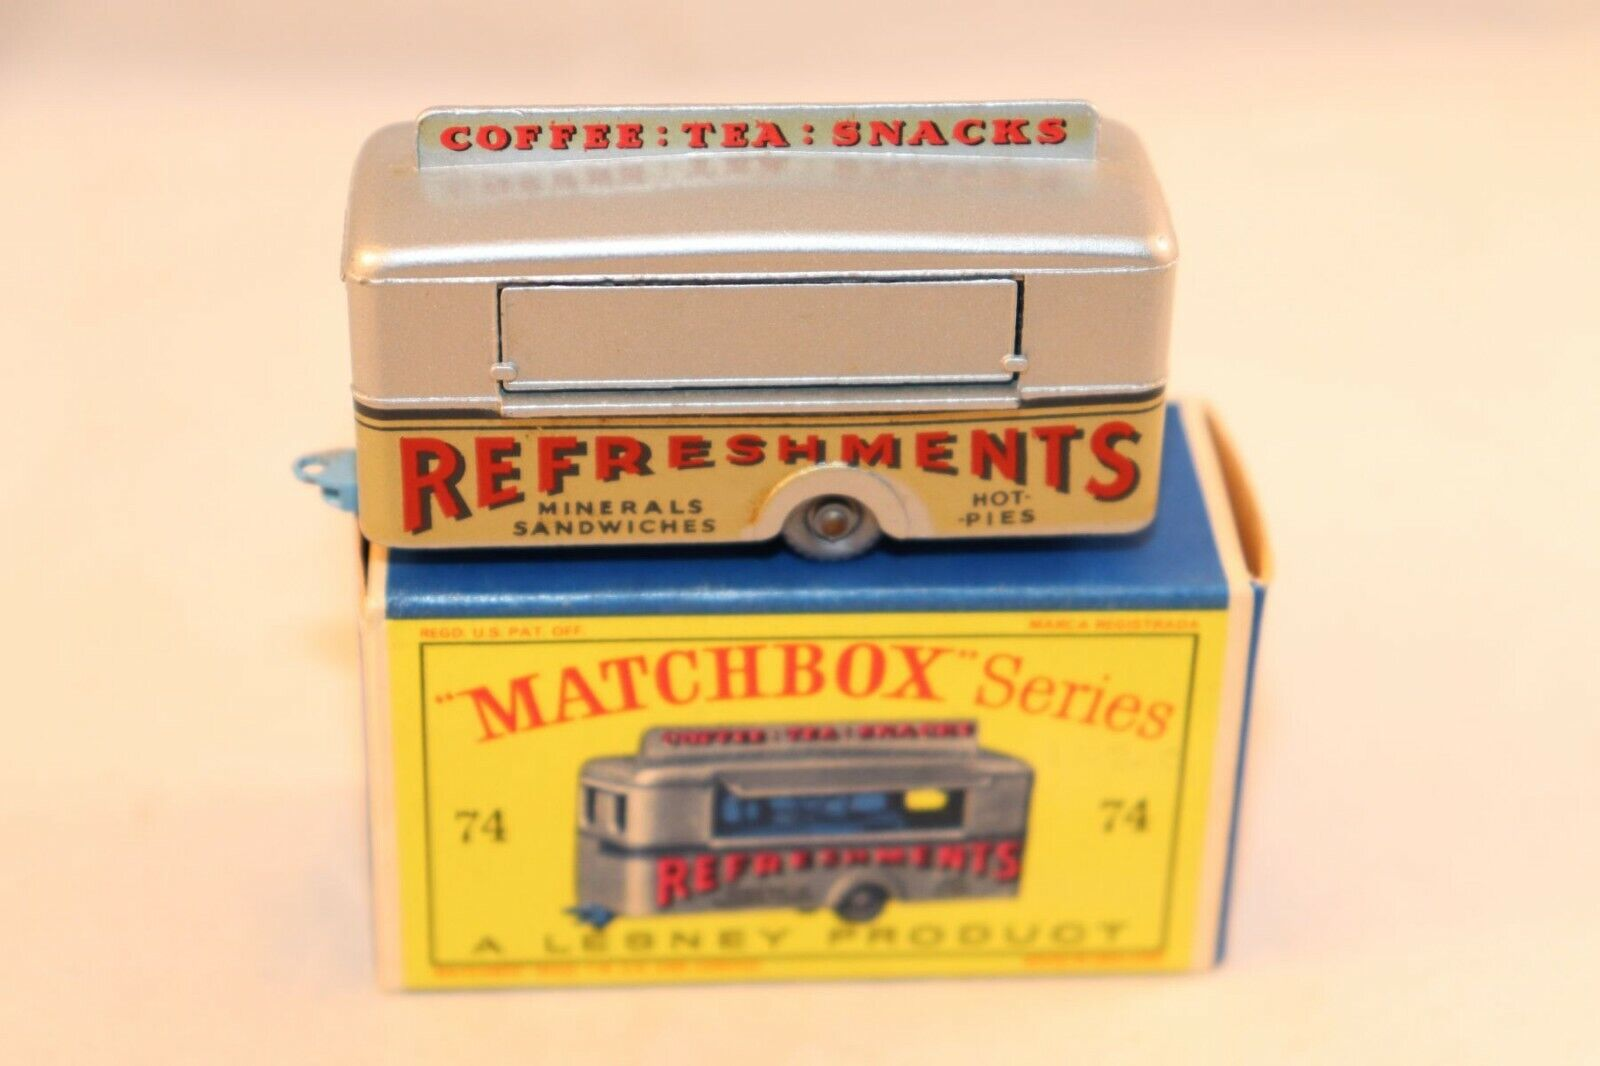 Matchbox  Lesney No 74 Mobile Canteen mint in box all original condition GPW  coloris étonnants